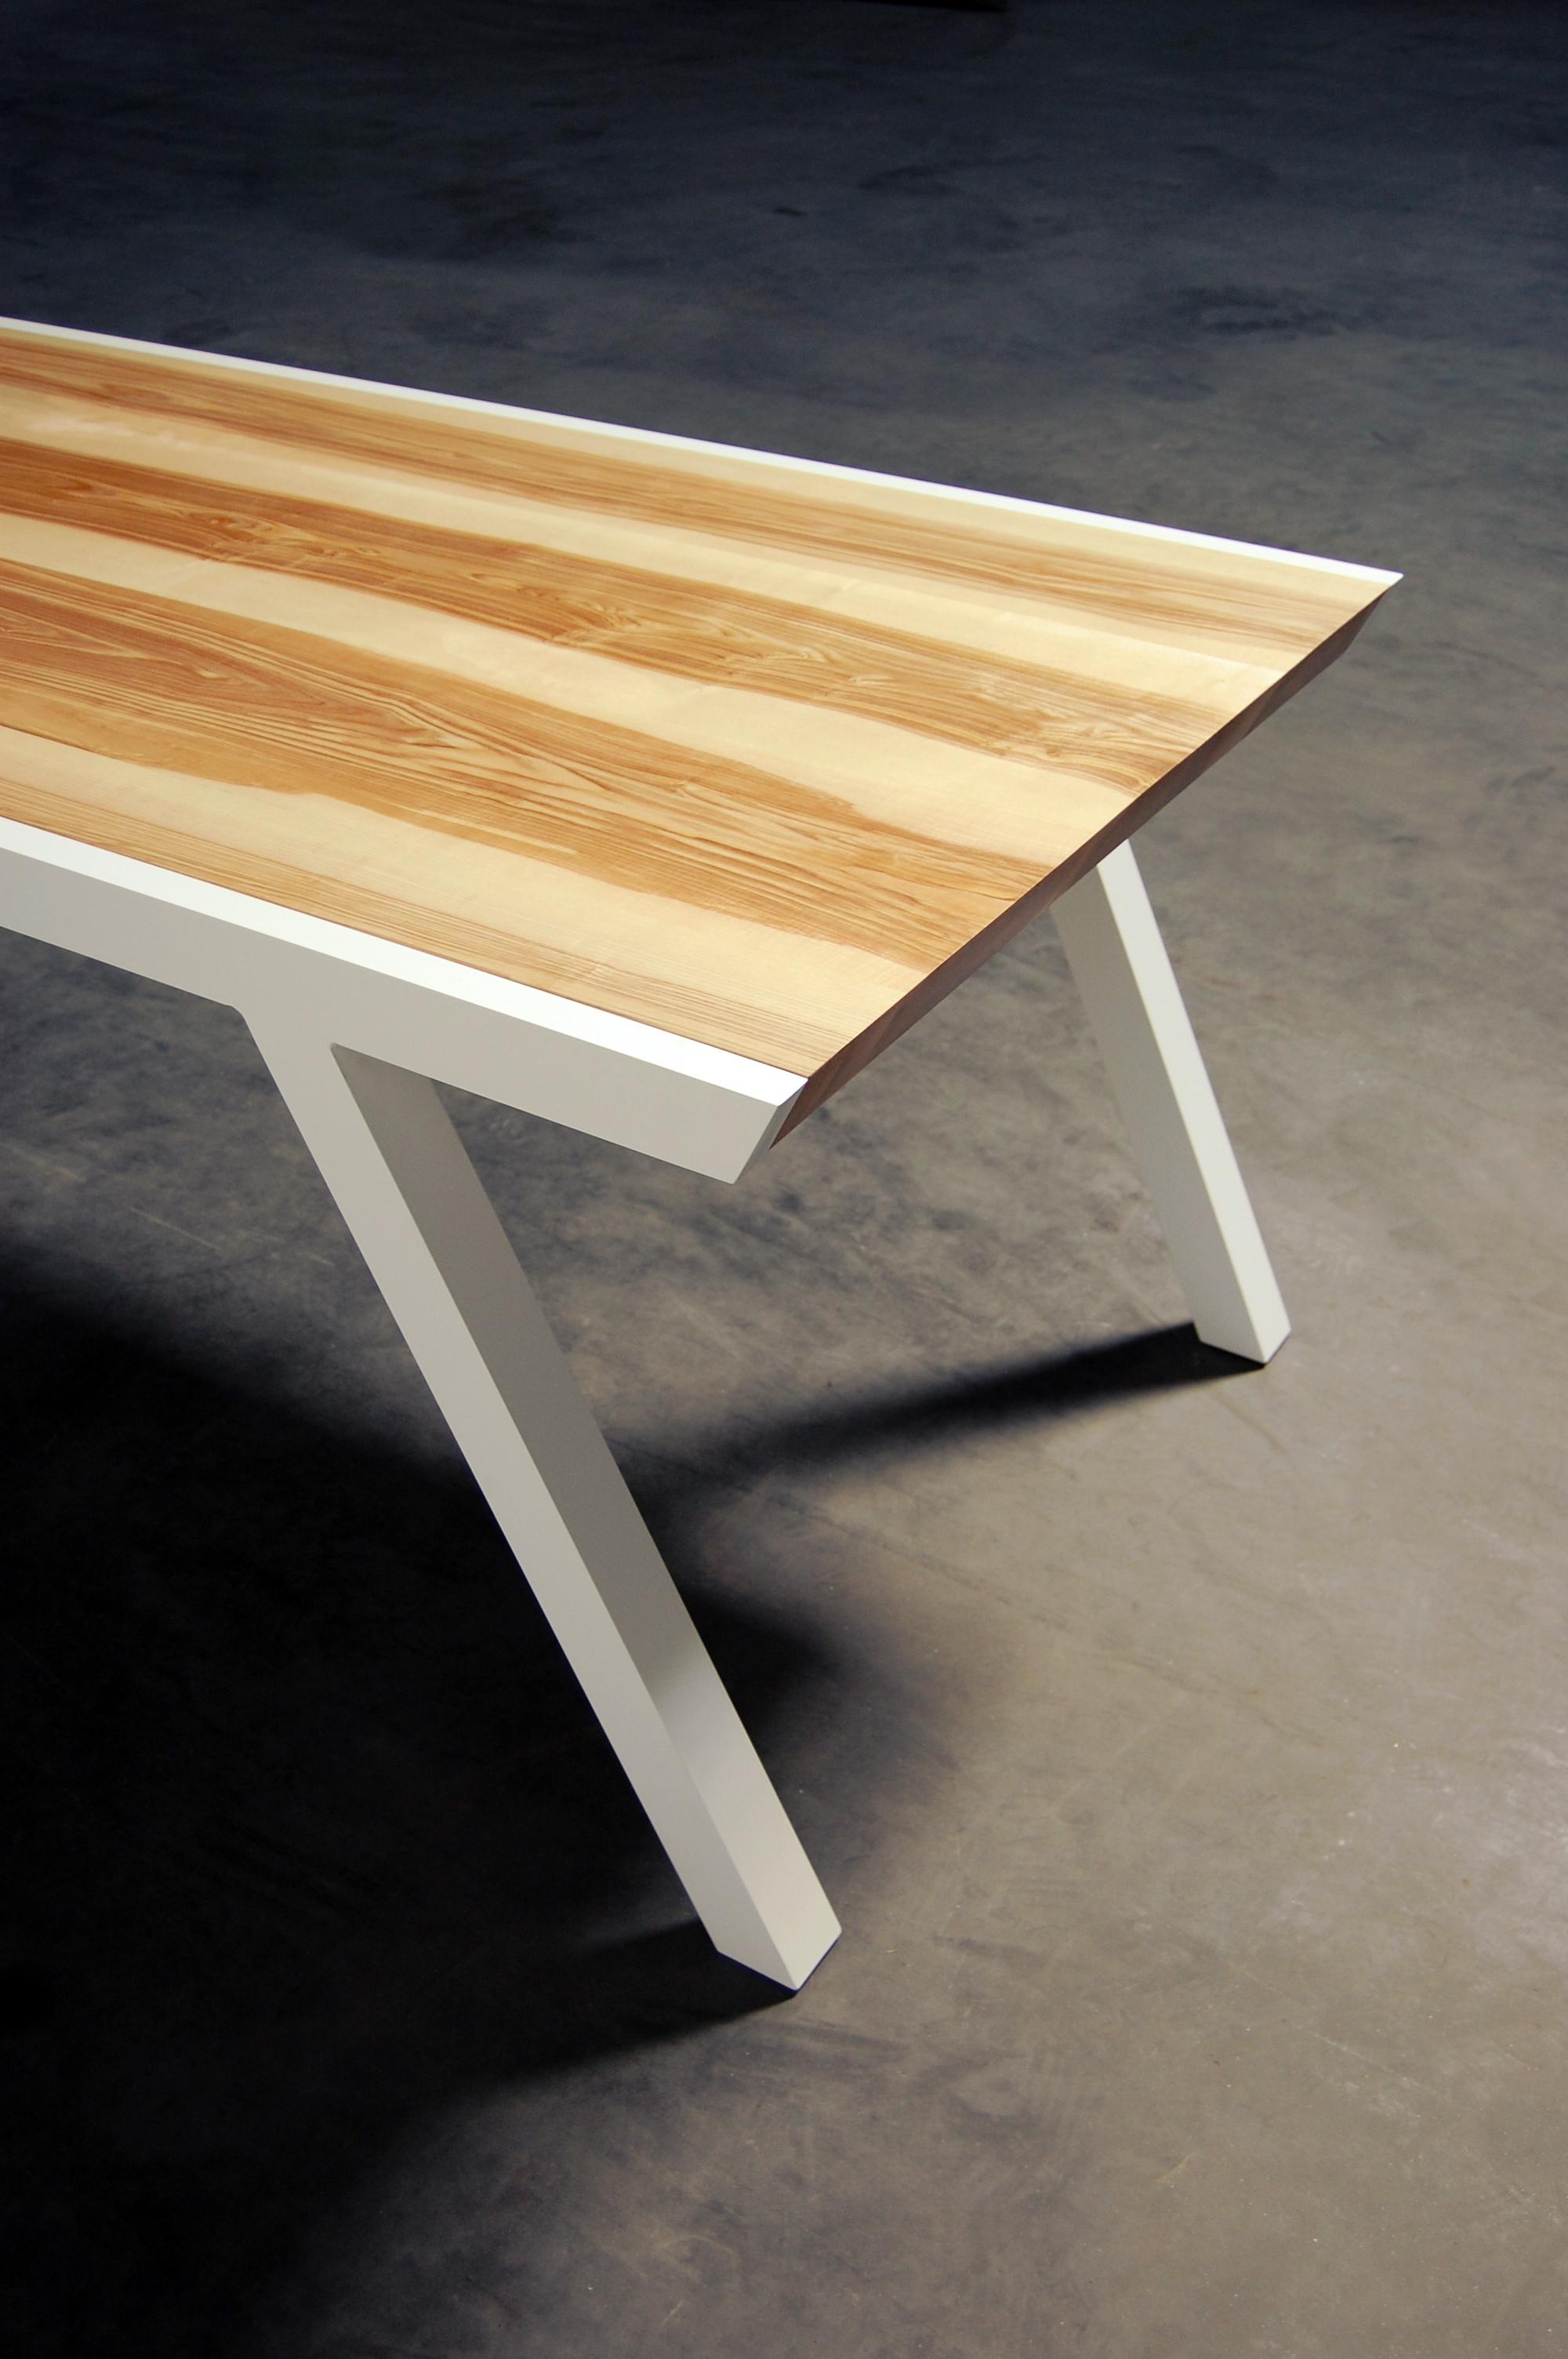 Table profil m tal et bois massif fabrication artisanale - Fabrication table bois ...